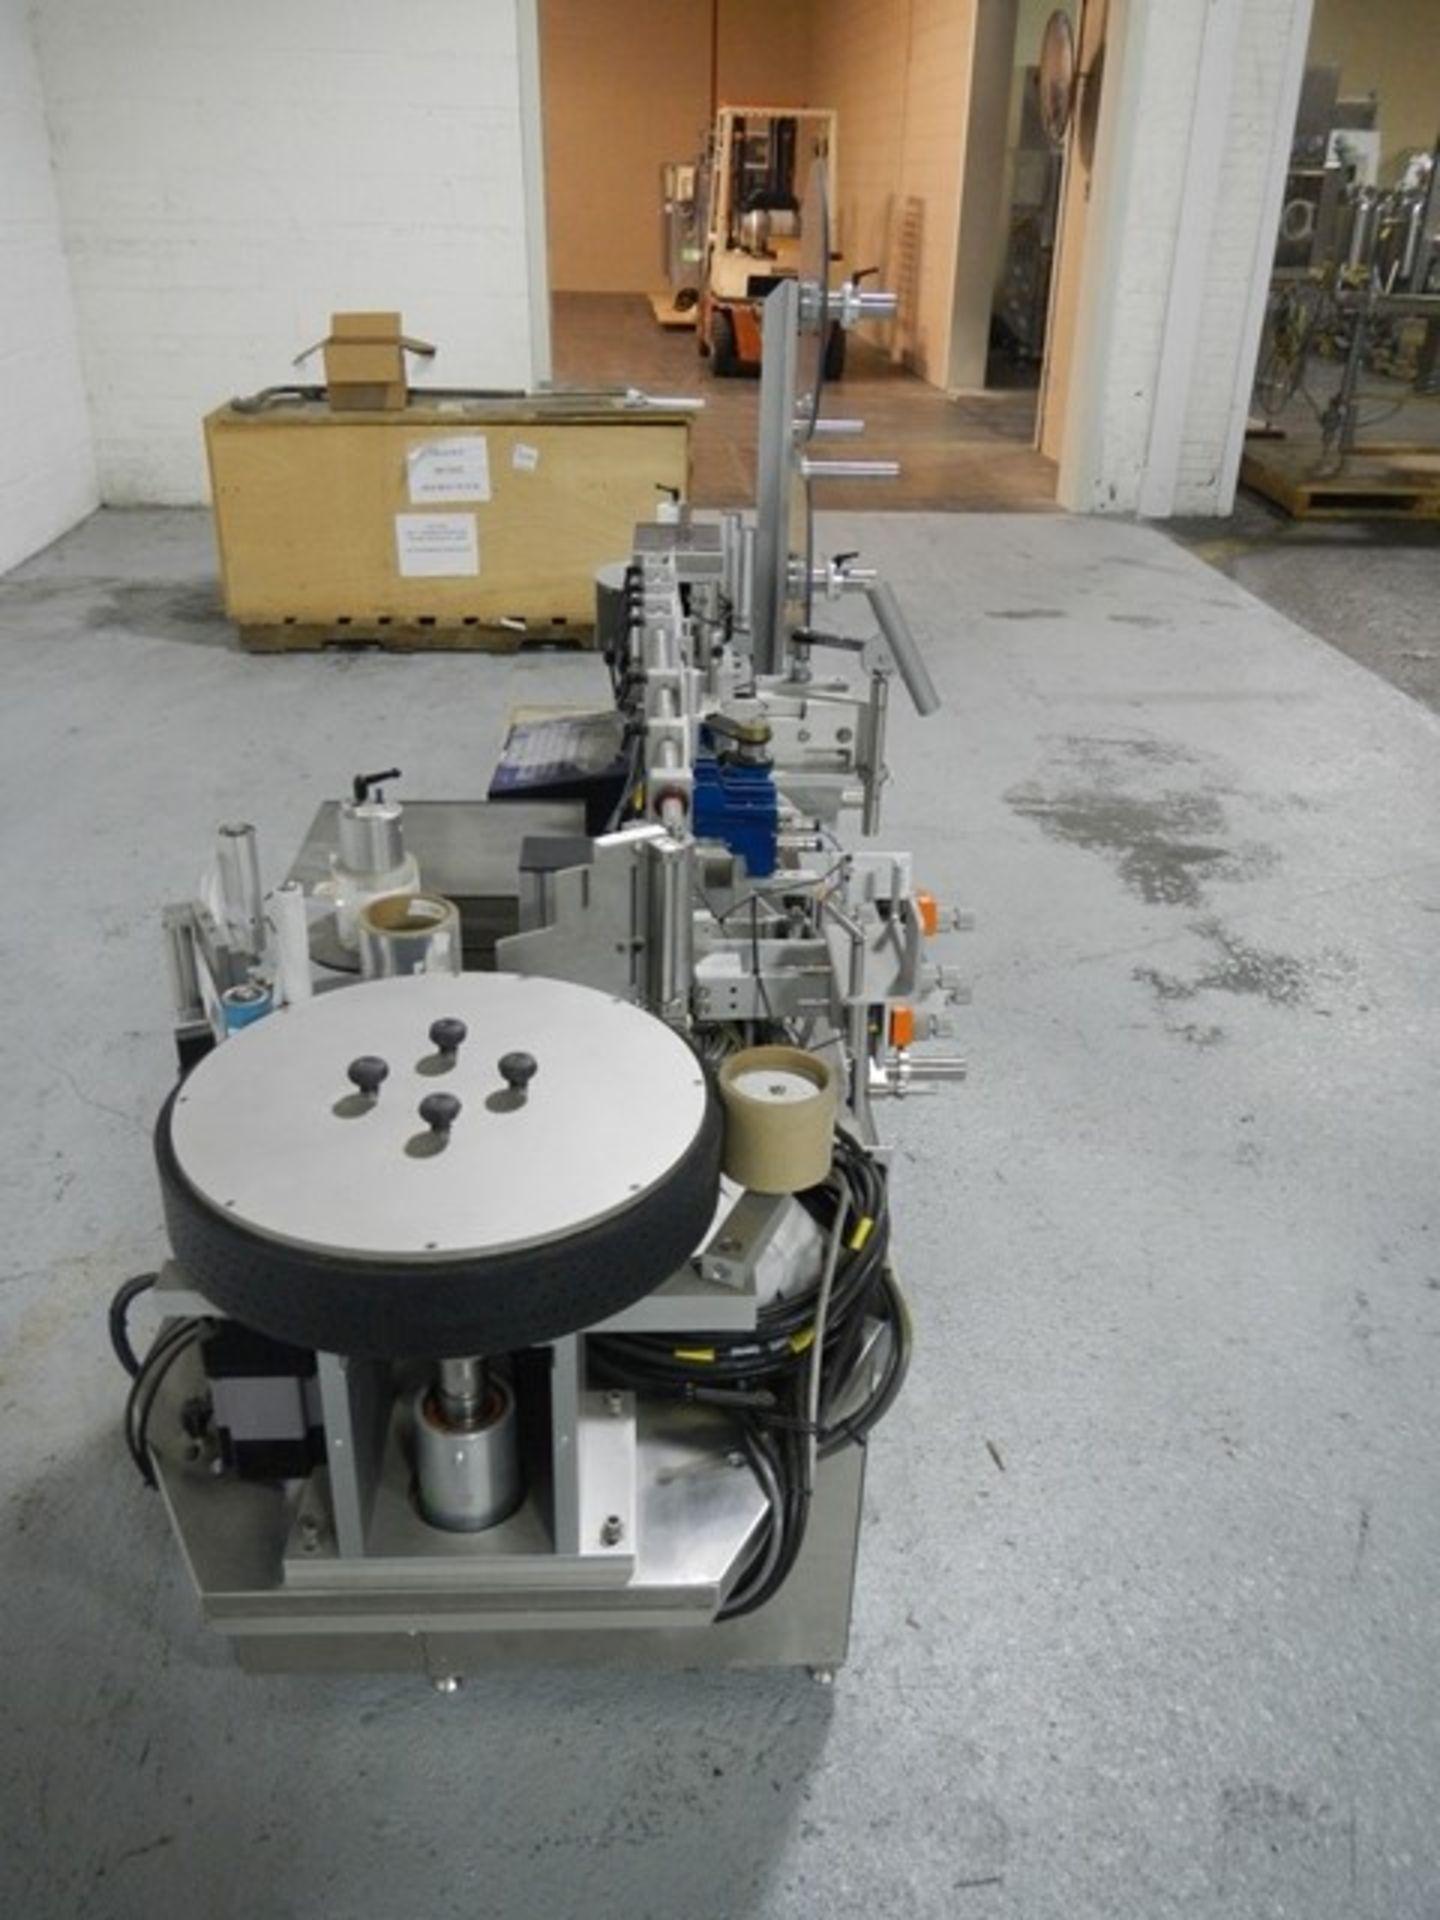 Lot 6 - Weiler wrap around labeler, model LA-3000L, for square bottles, 3 panel wrap